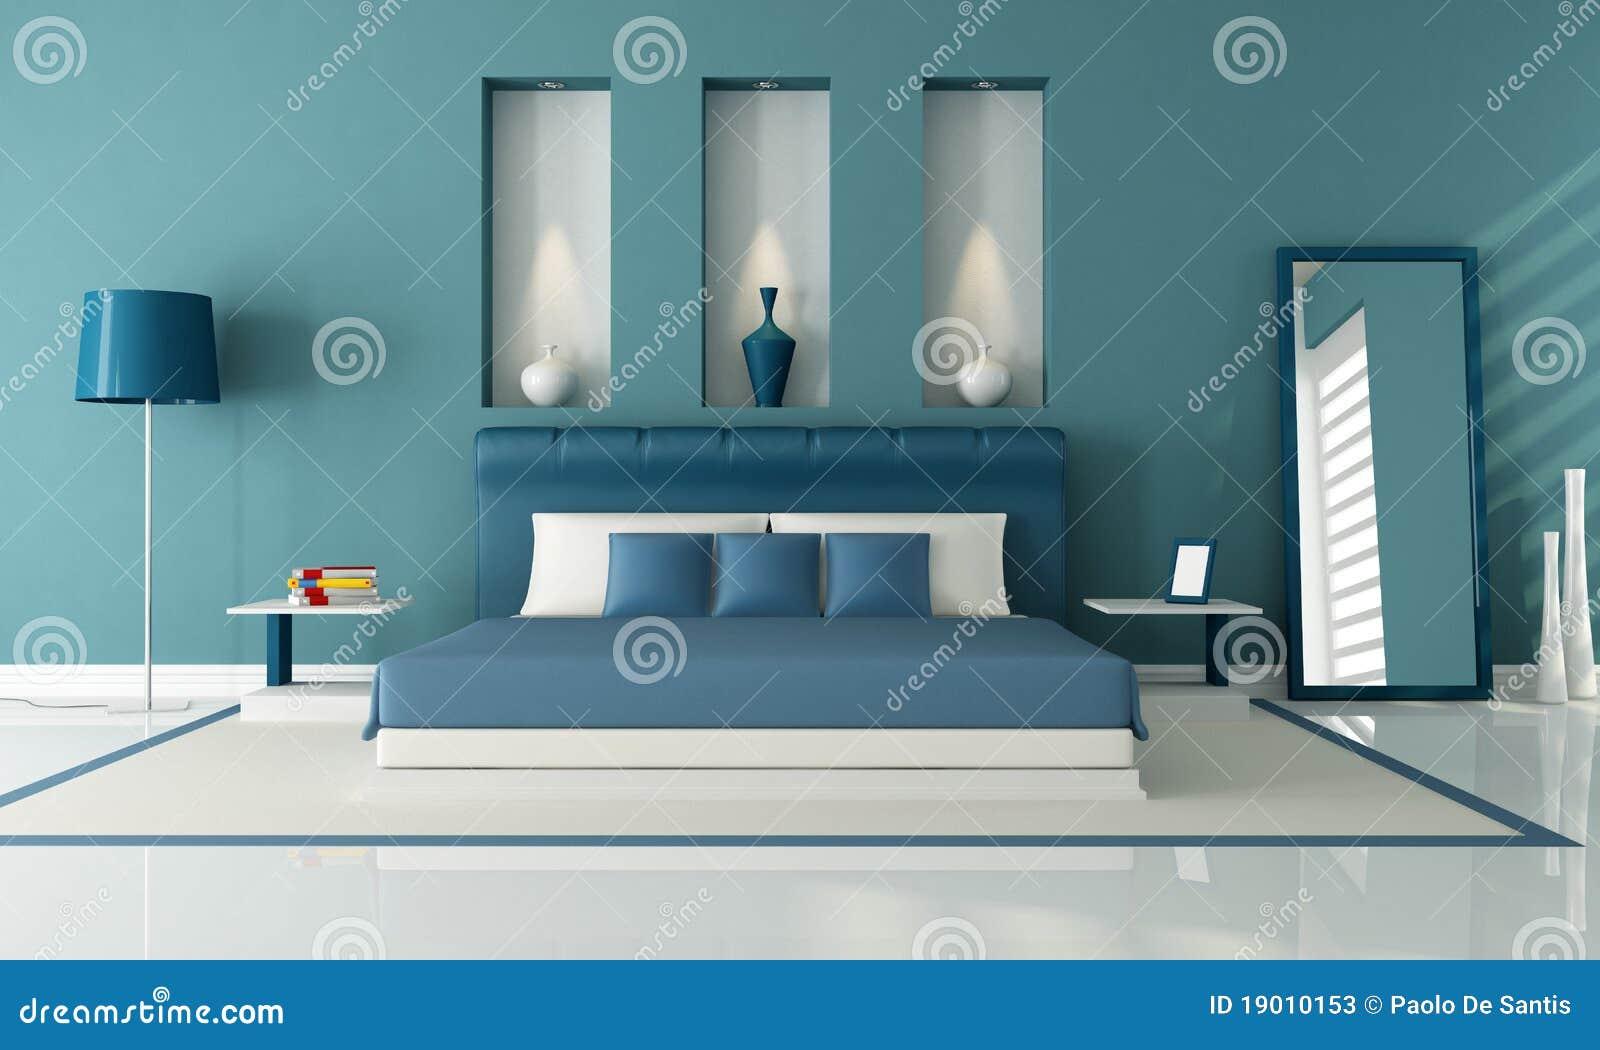 Blauwe Slaapkamer Muur : Blauwe Slaapkamer Stock Fotos - Afbeelding ...